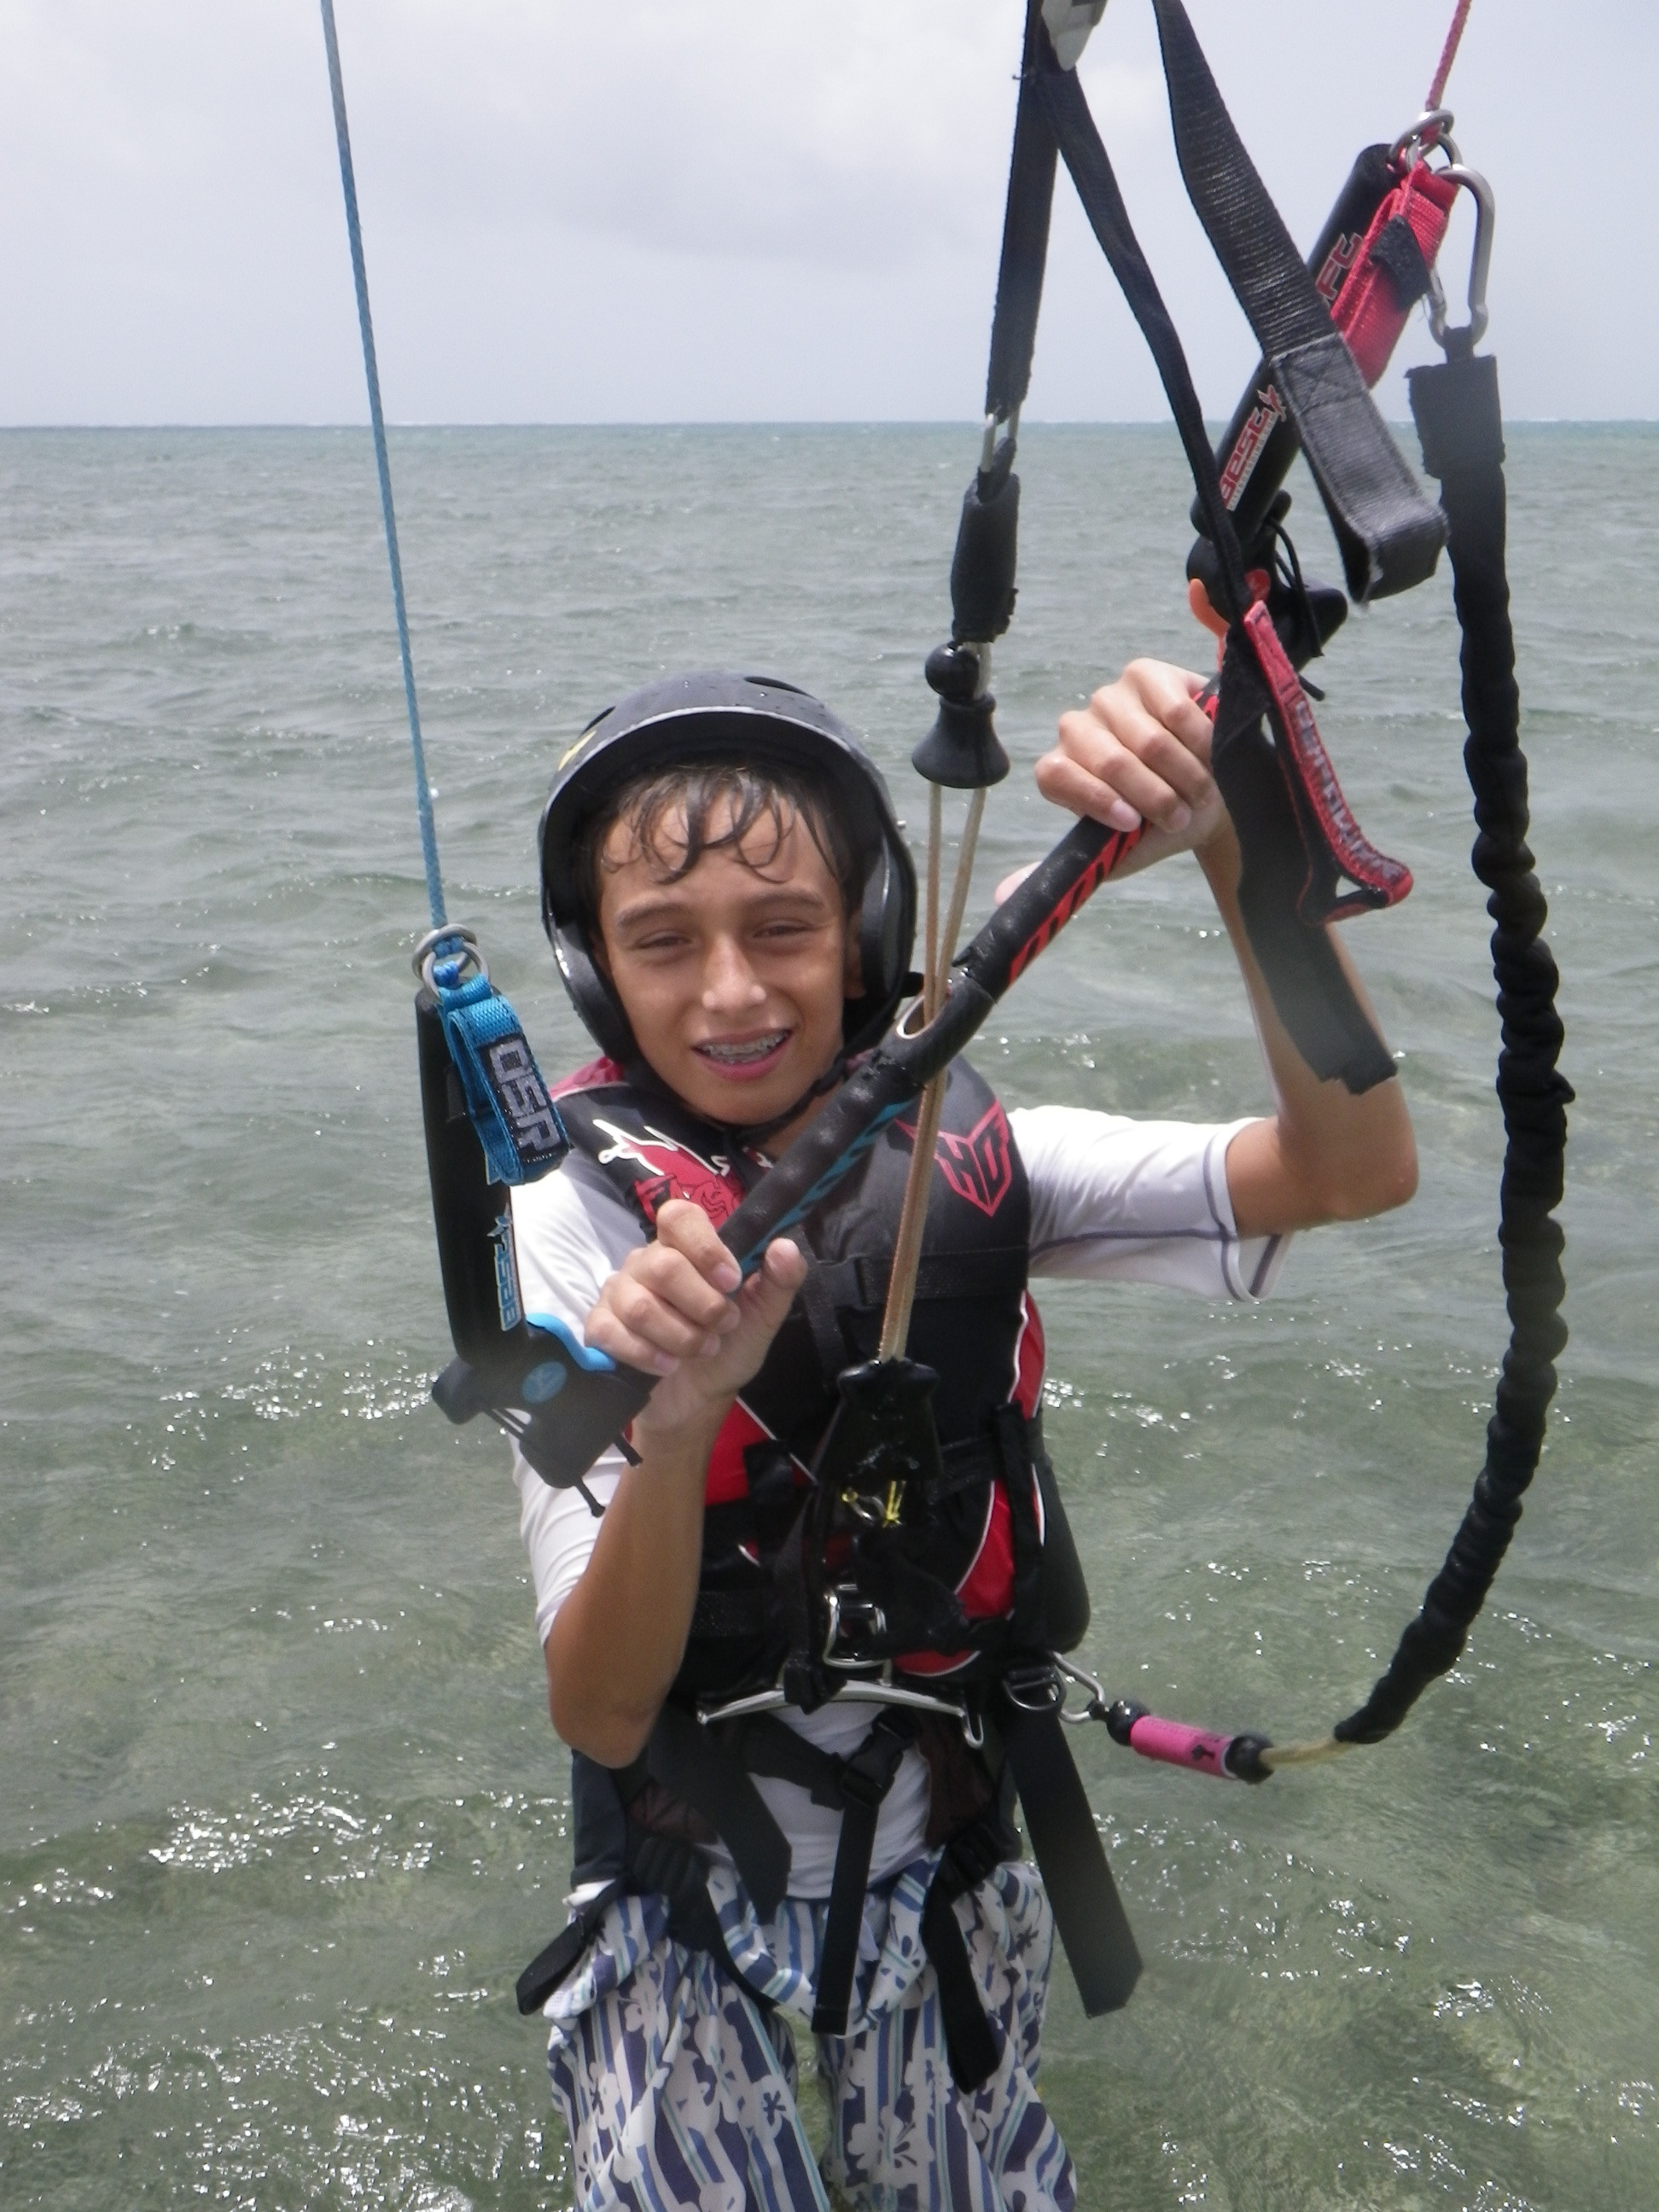 Cours de kitesurf collectif